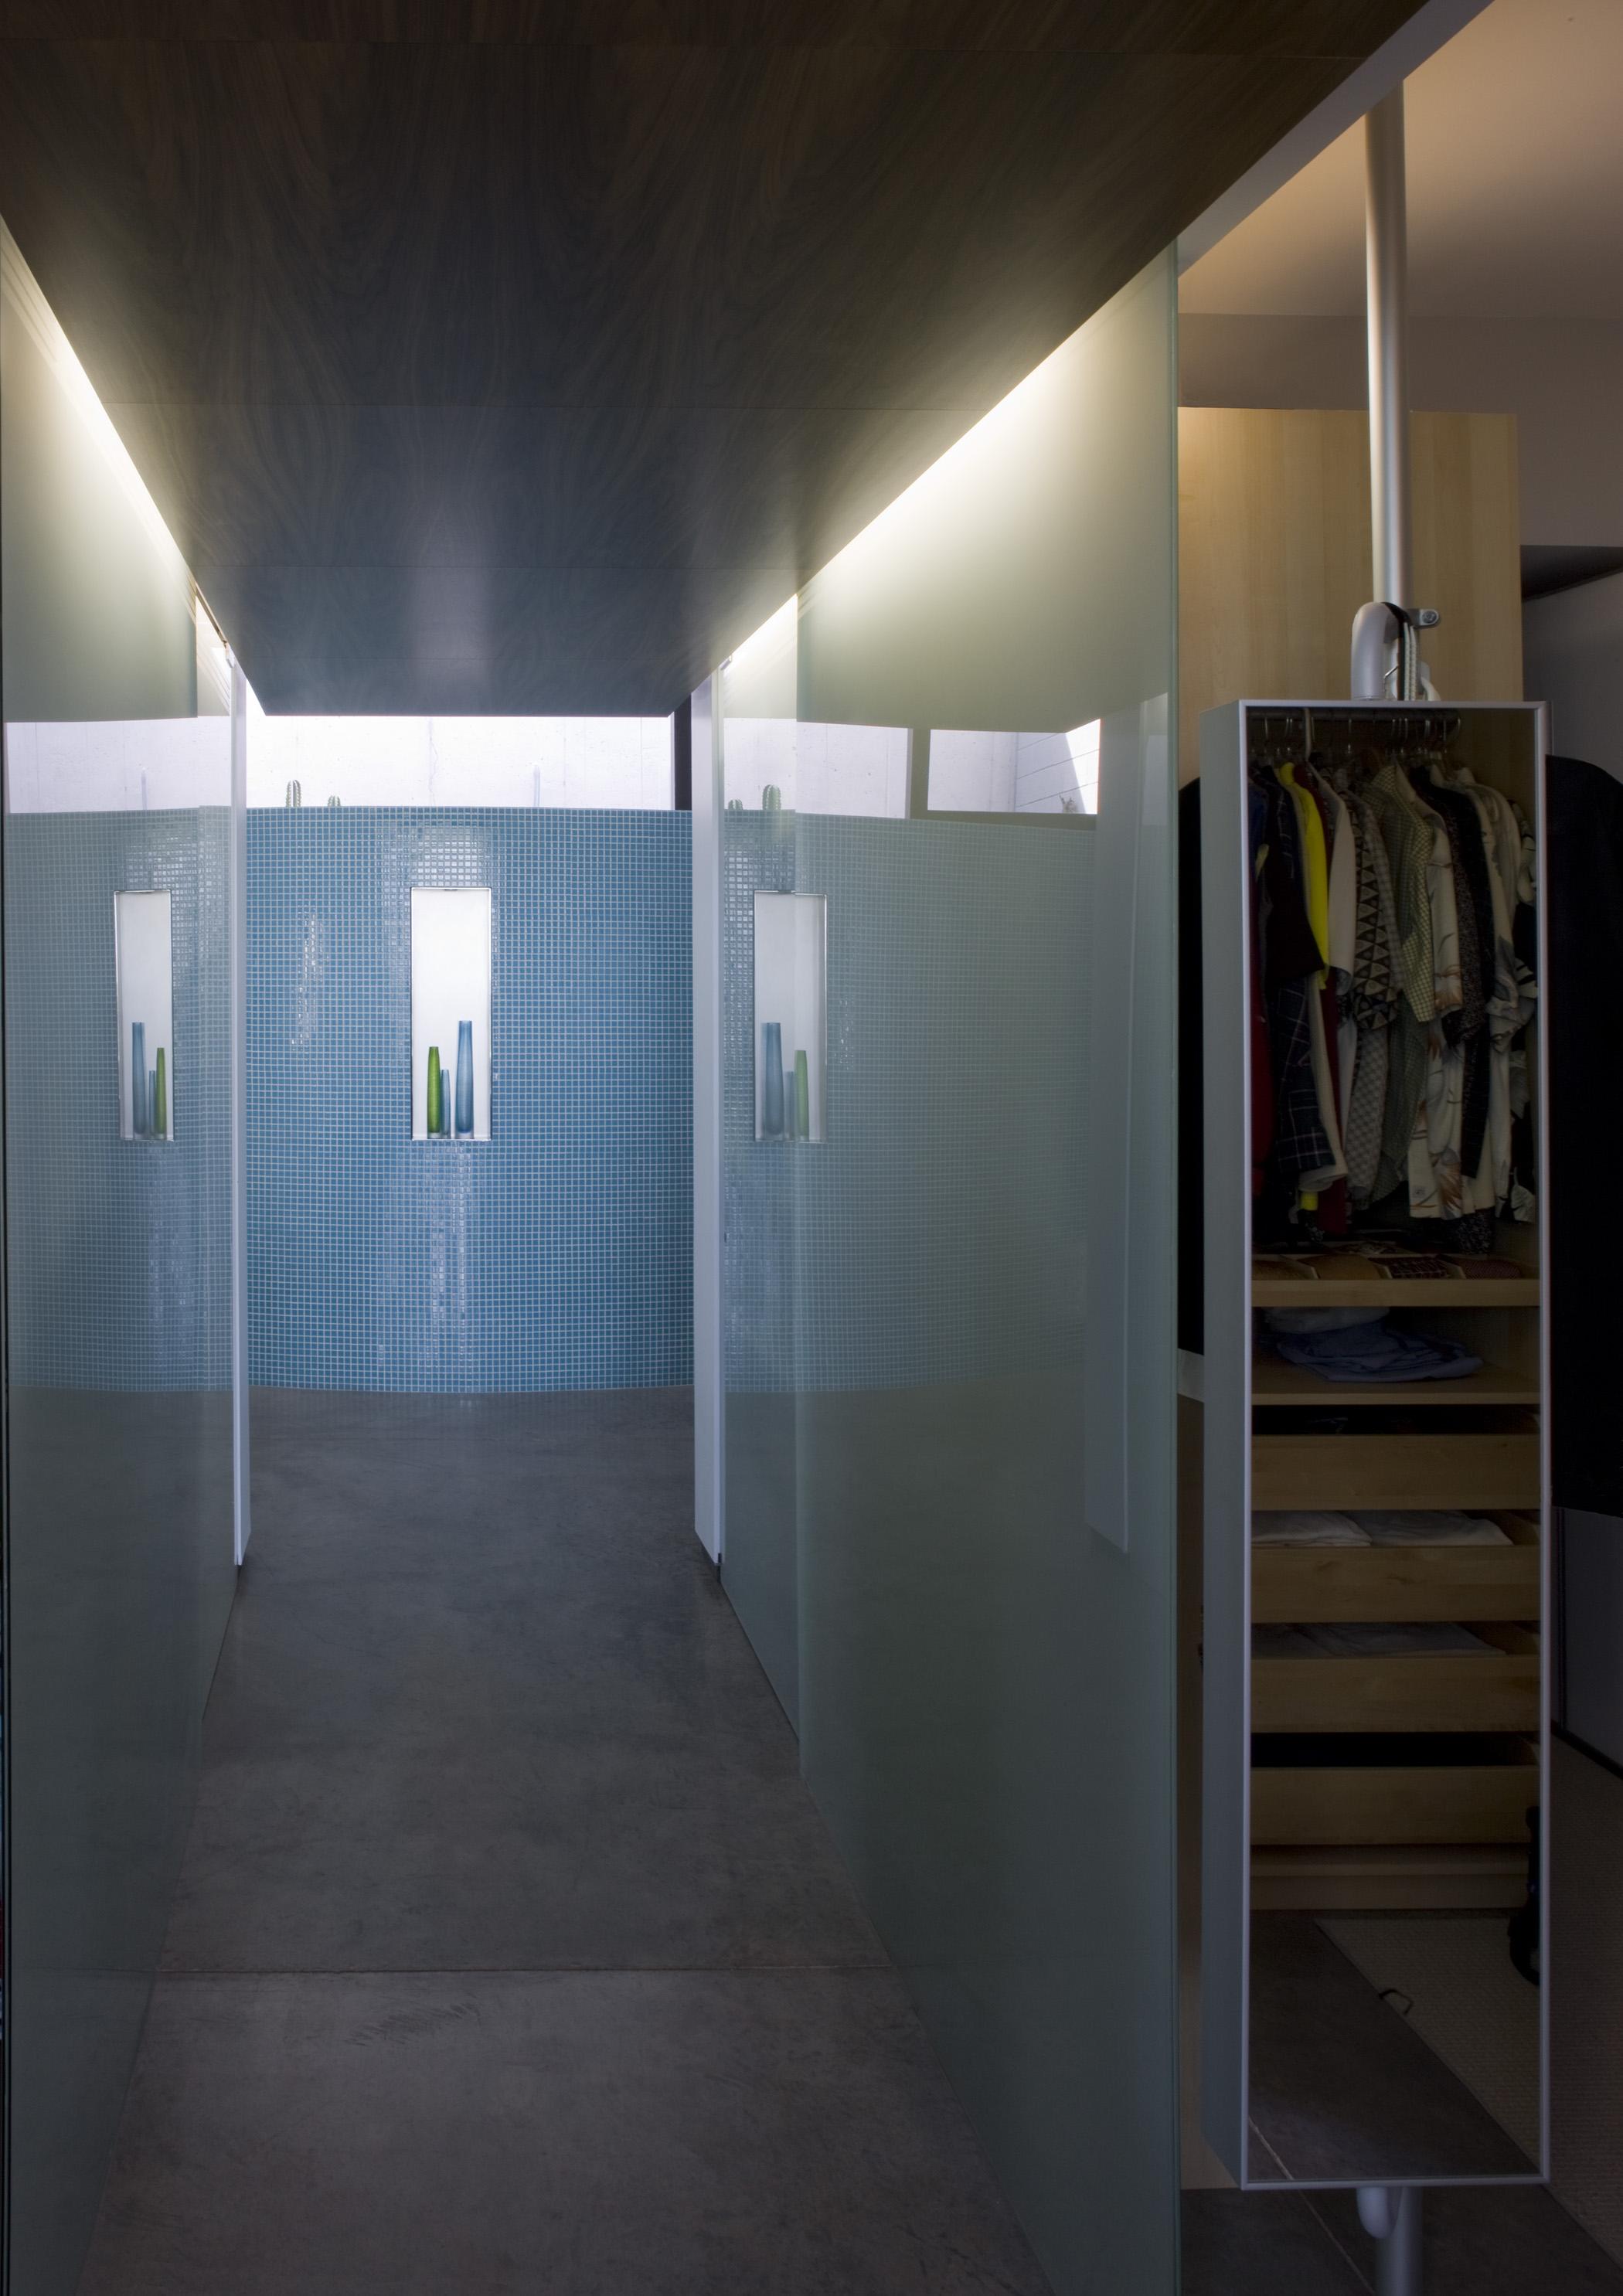 13 Chen + Suchart Studio LLC - Mummy Mountain Res Image.jpg